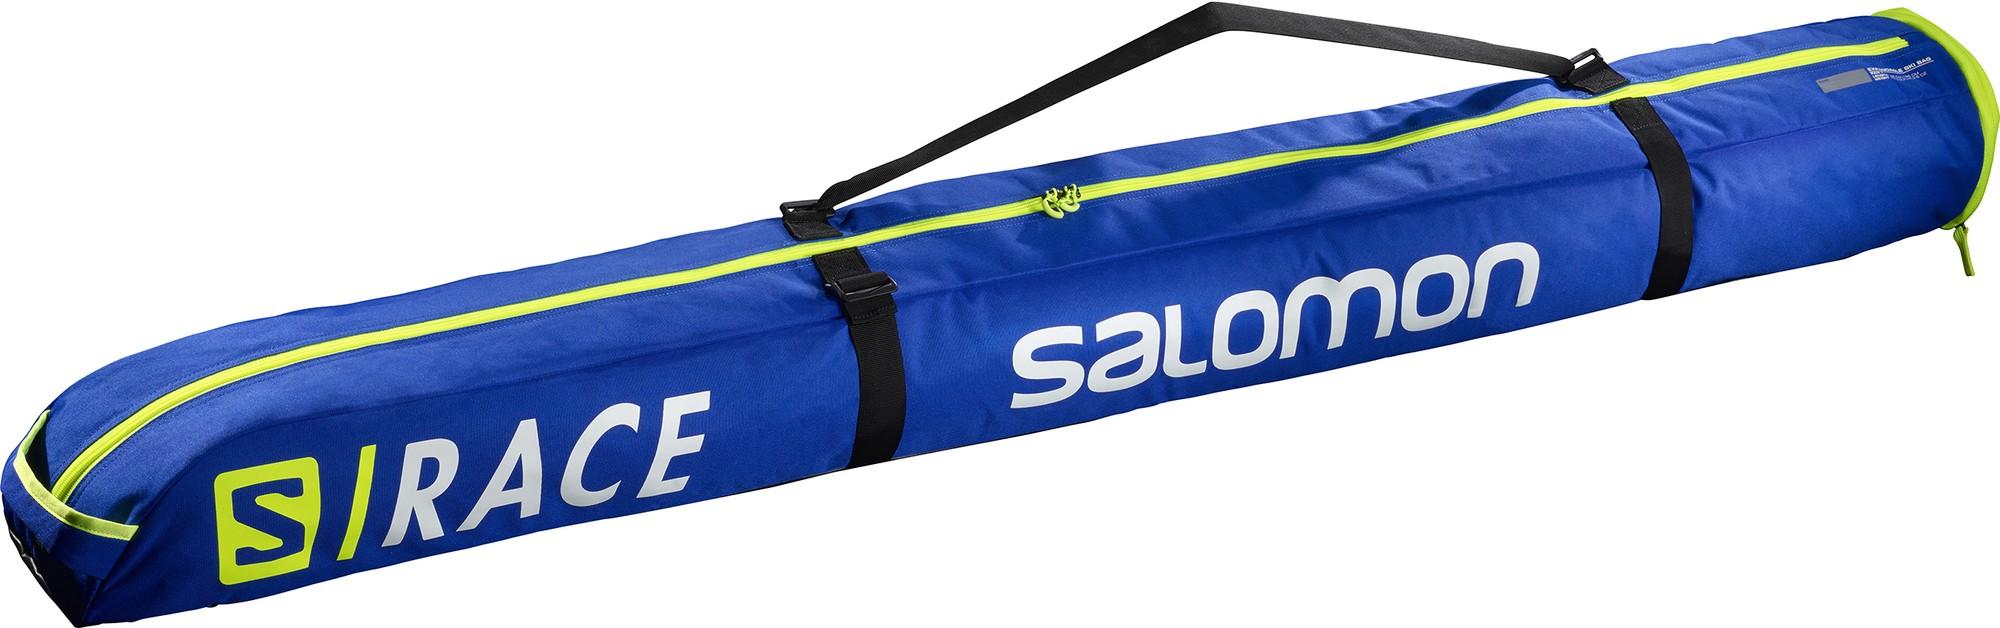 Salomon Чехол для горных лыж Salomon Extend, 1 пара, 165+20 см